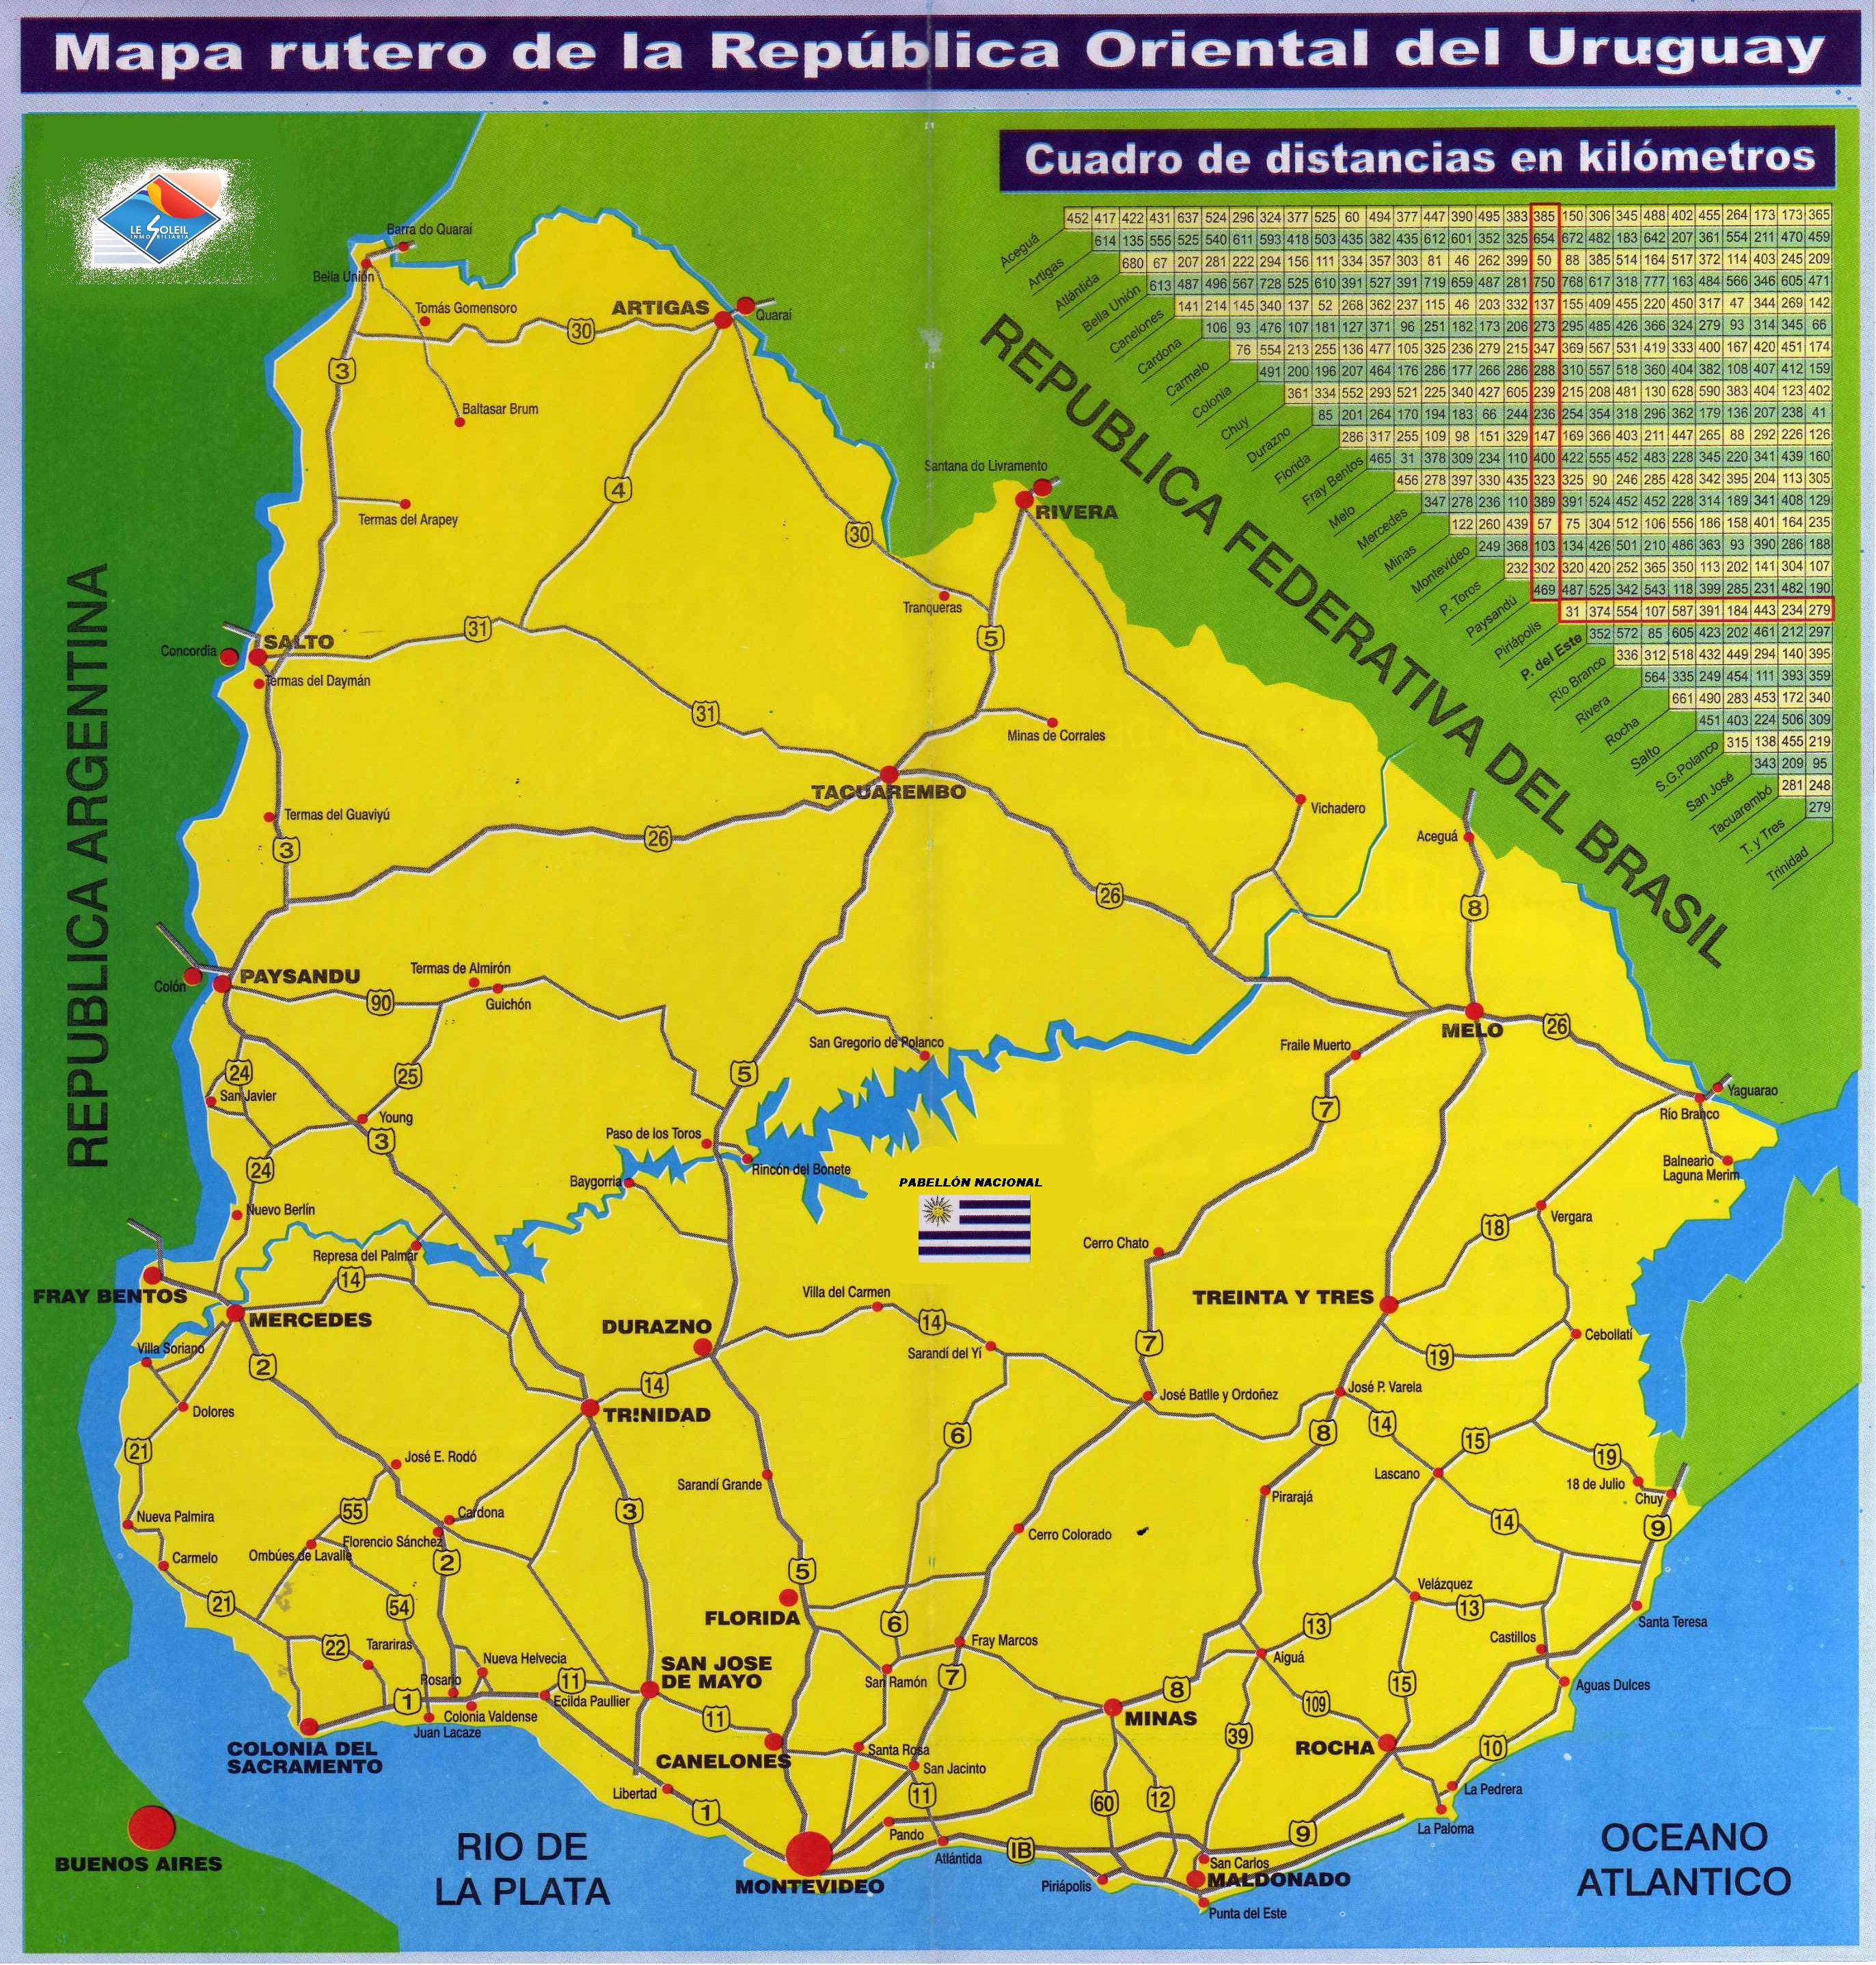 Large Scale Road Map Of Uruguay Uruguay South America - Uruguay map atlas